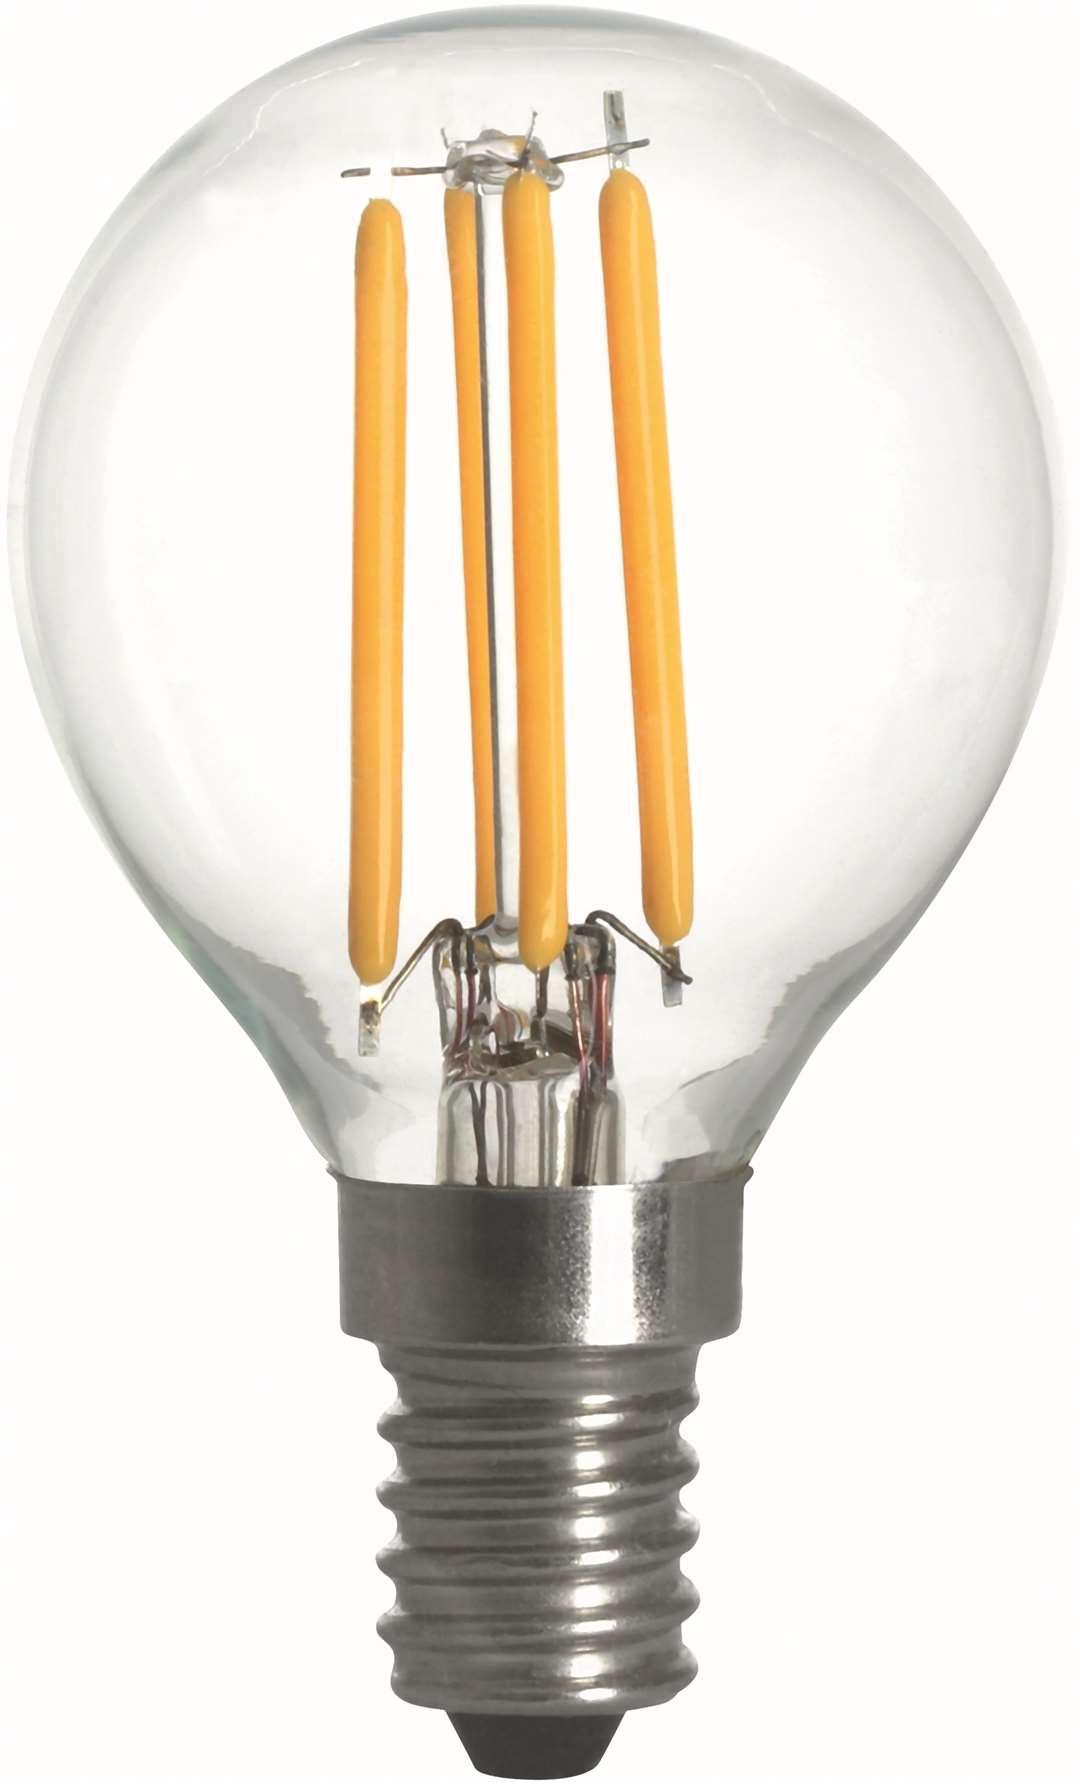 Filament Led-Lampa, Klot, 4W, E14, 230V